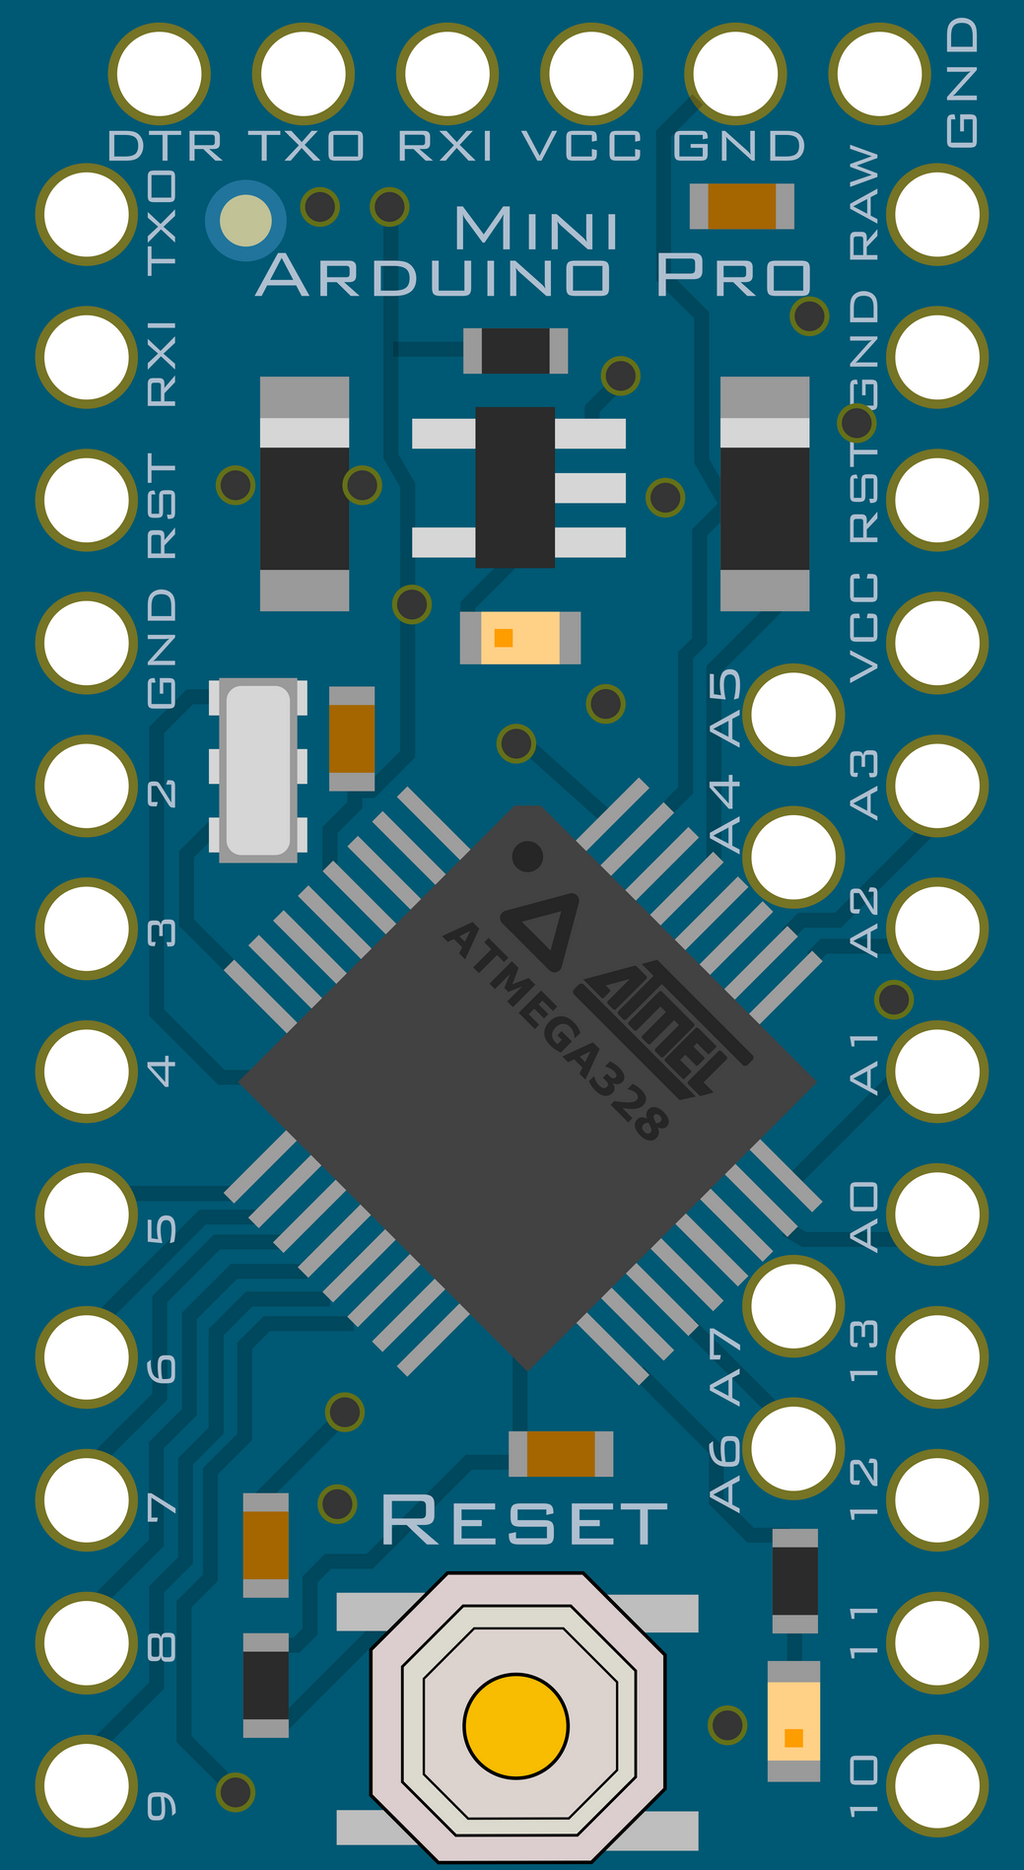 Arduino r like pro mini clipart by adlerweb on deviantart